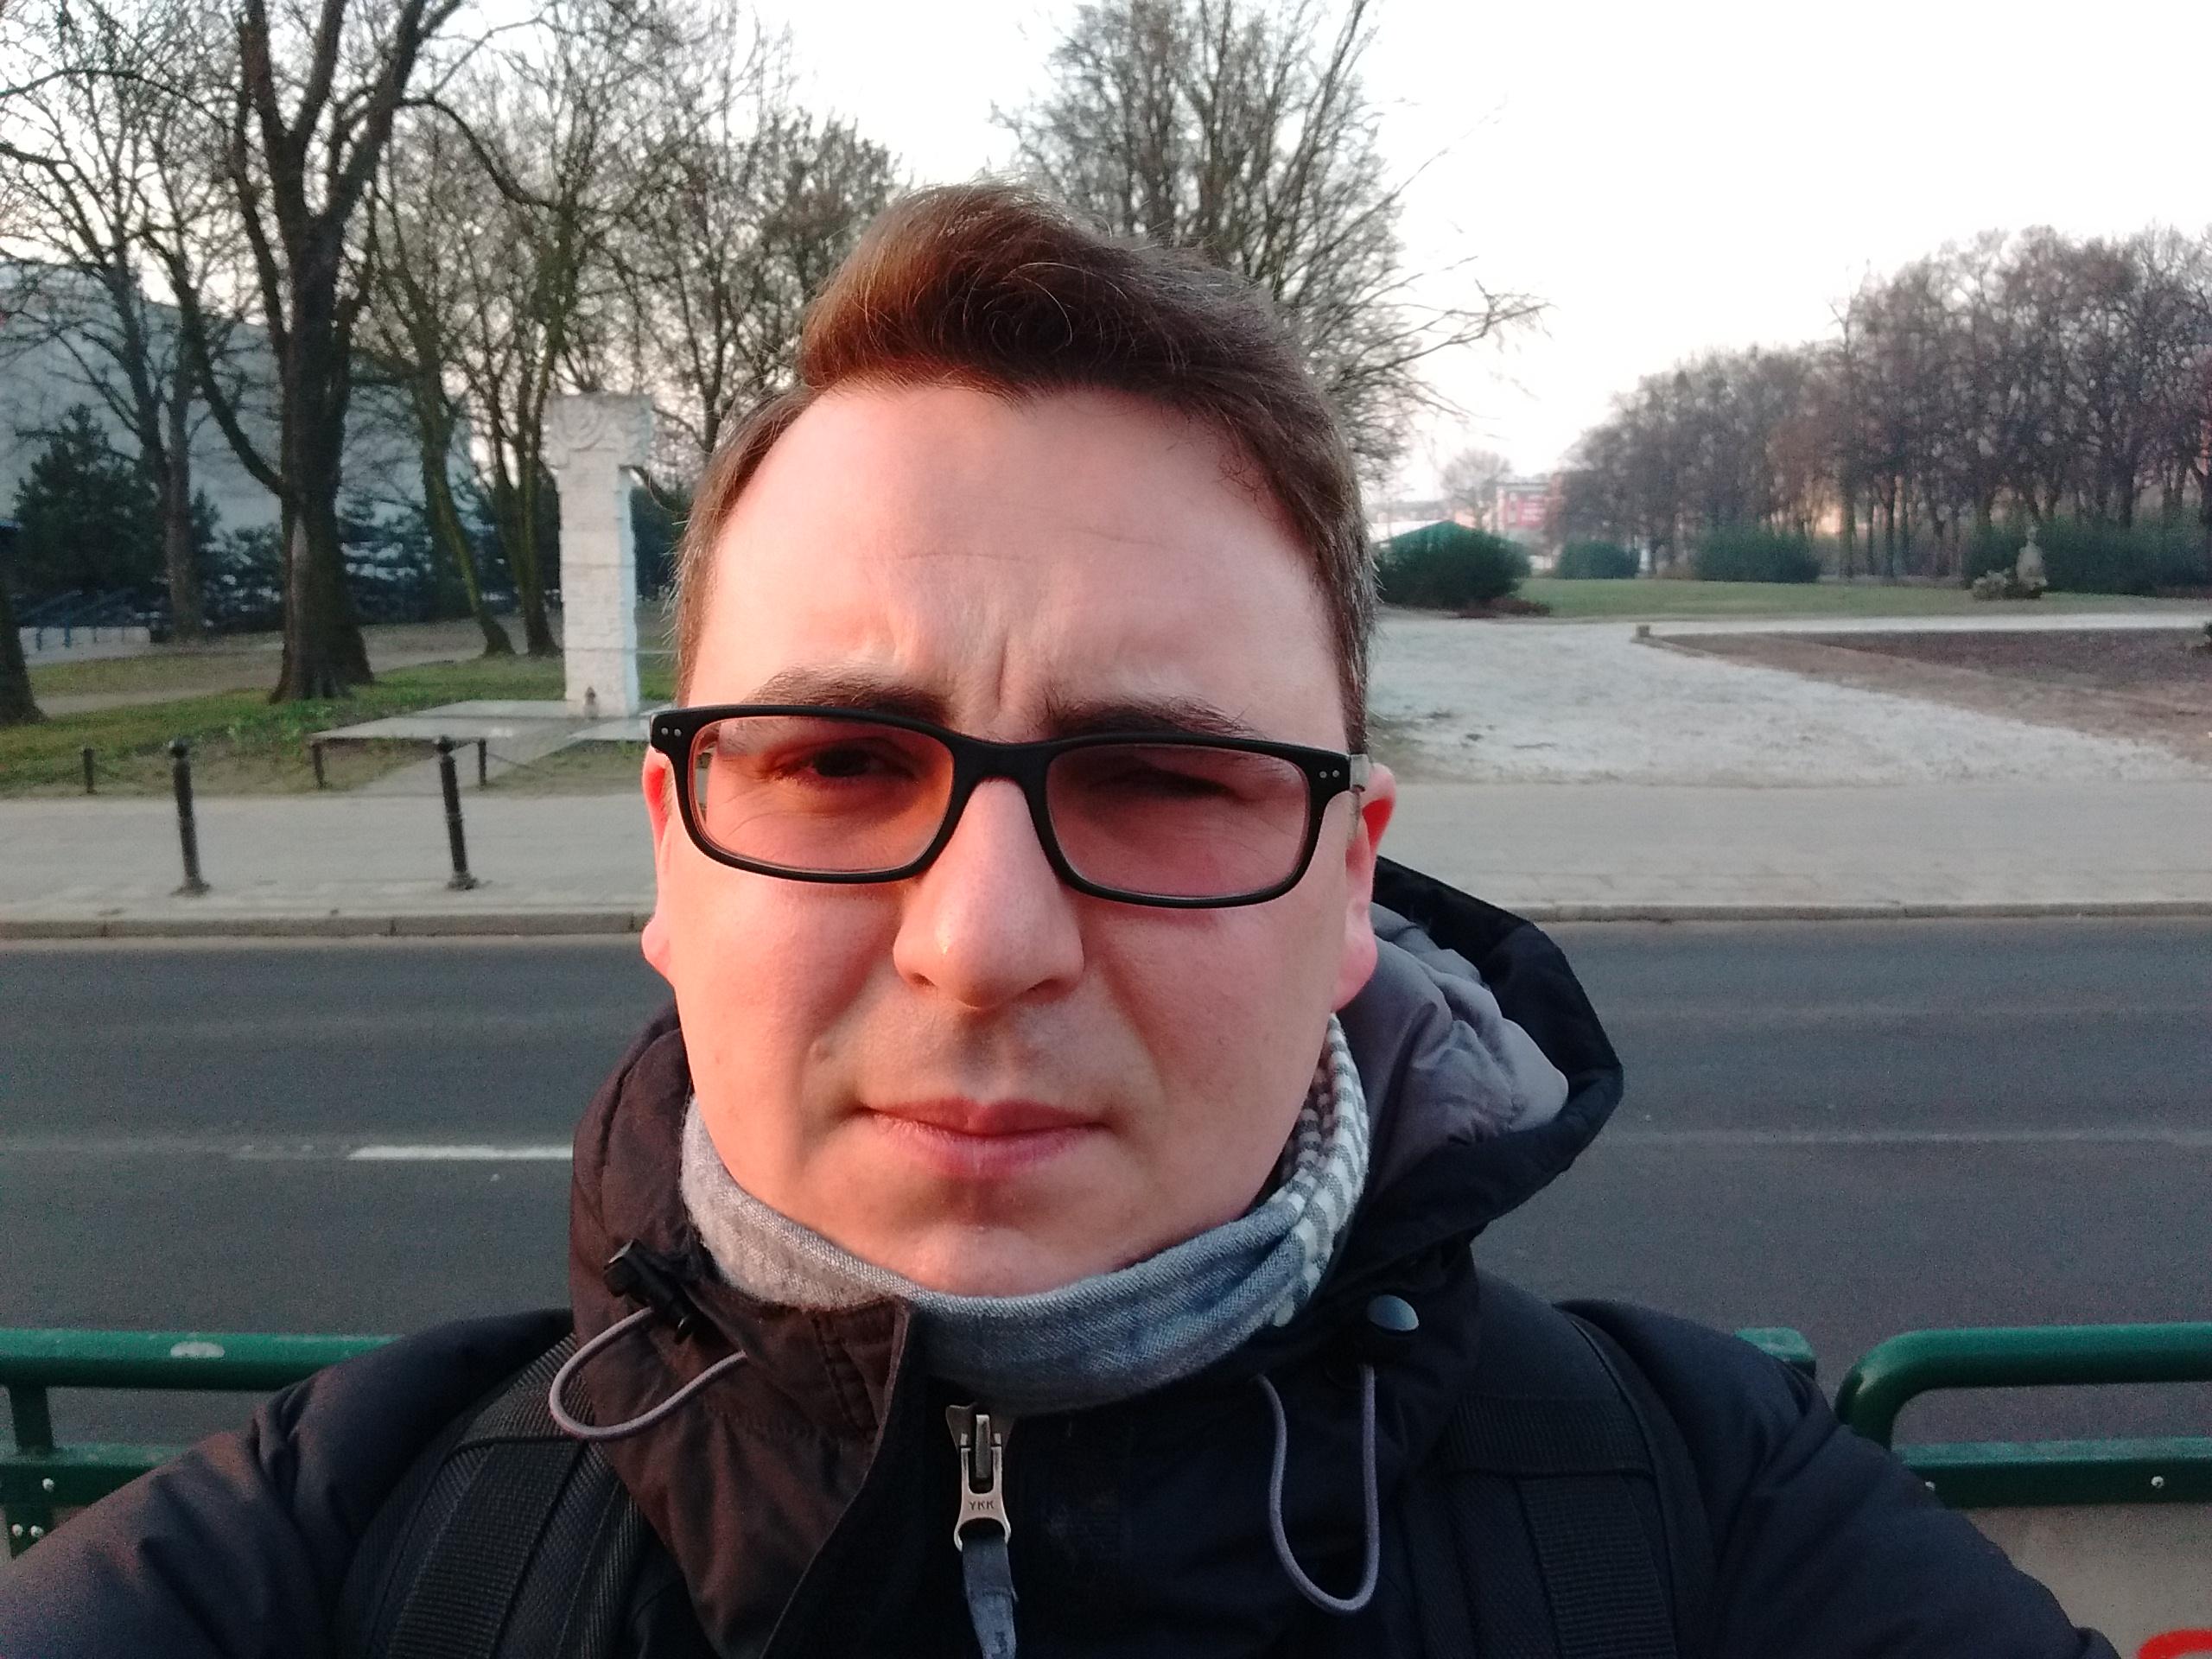 Lenovo Motorola Moto G 3-gen. (2015) - selfie - 90sekund.pl